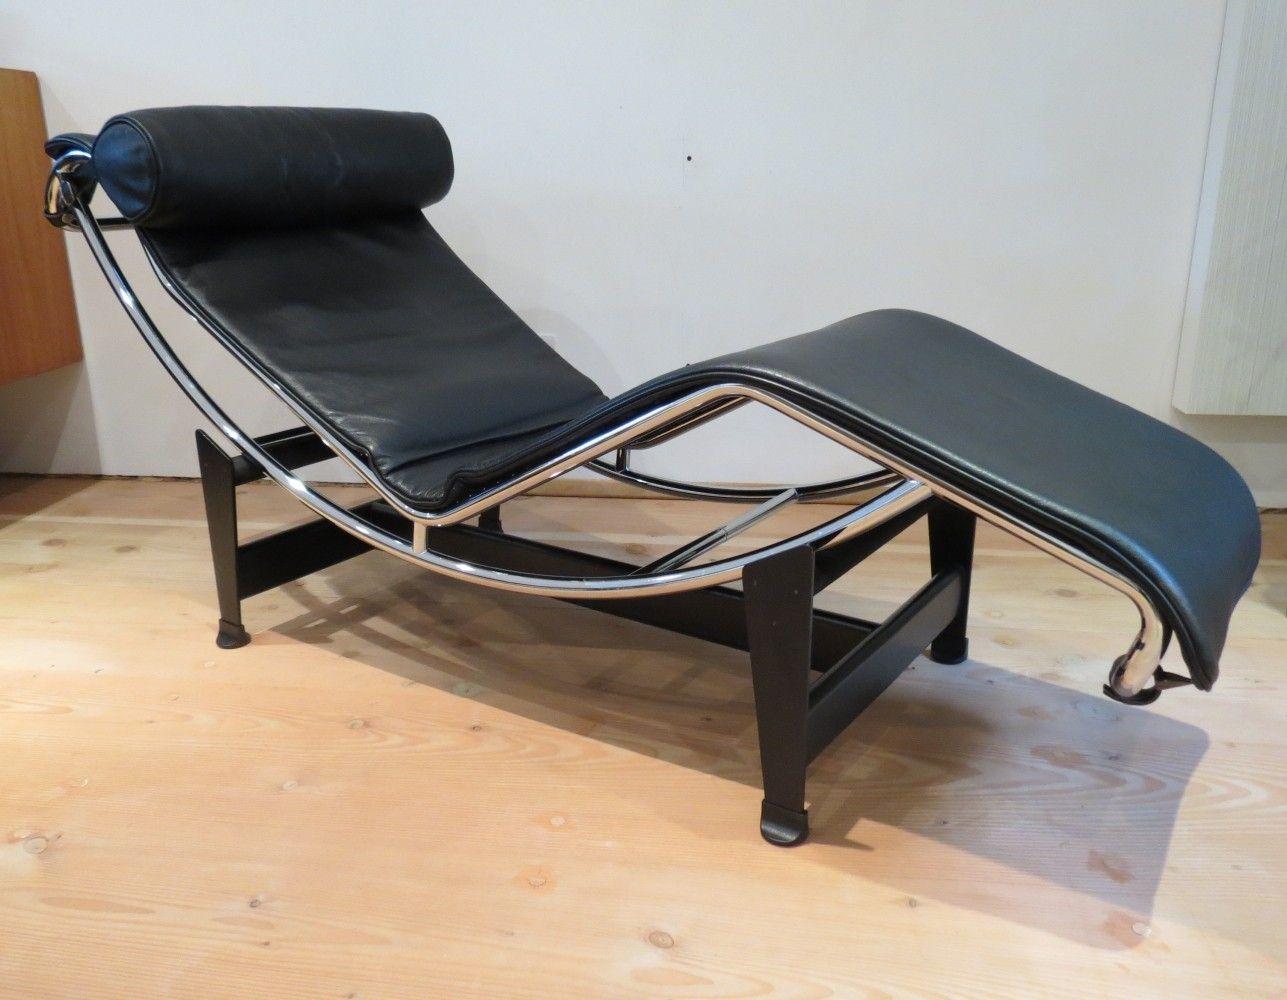 Sensational Lc4 Lounge Chair From The Nineties By Le Corbusier Inzonedesignstudio Interior Chair Design Inzonedesignstudiocom